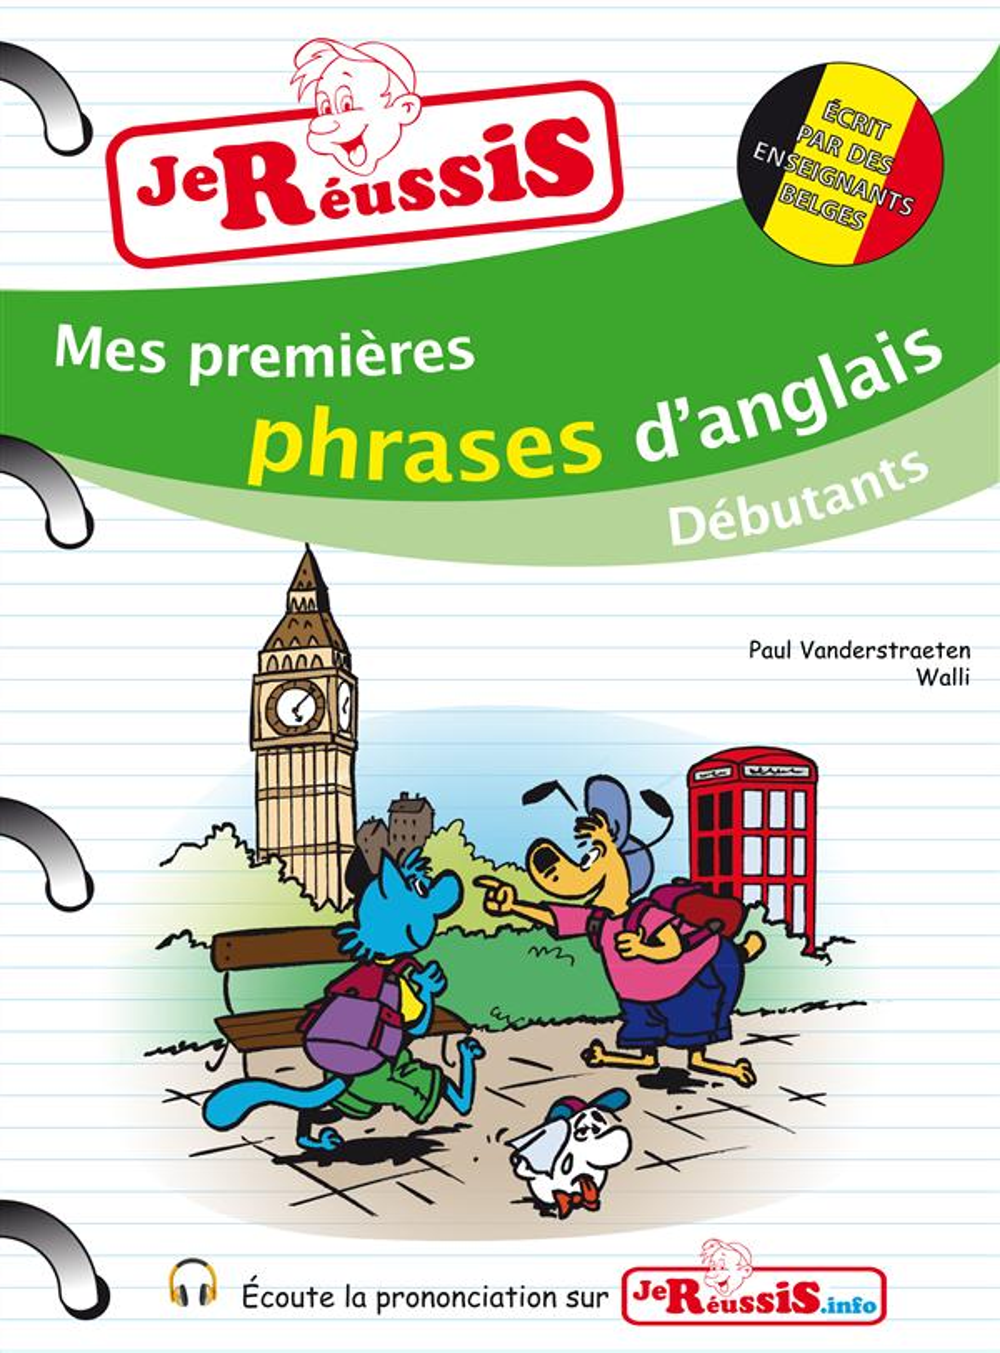 MES PREMIERES PHRASES D'ANGLAIS